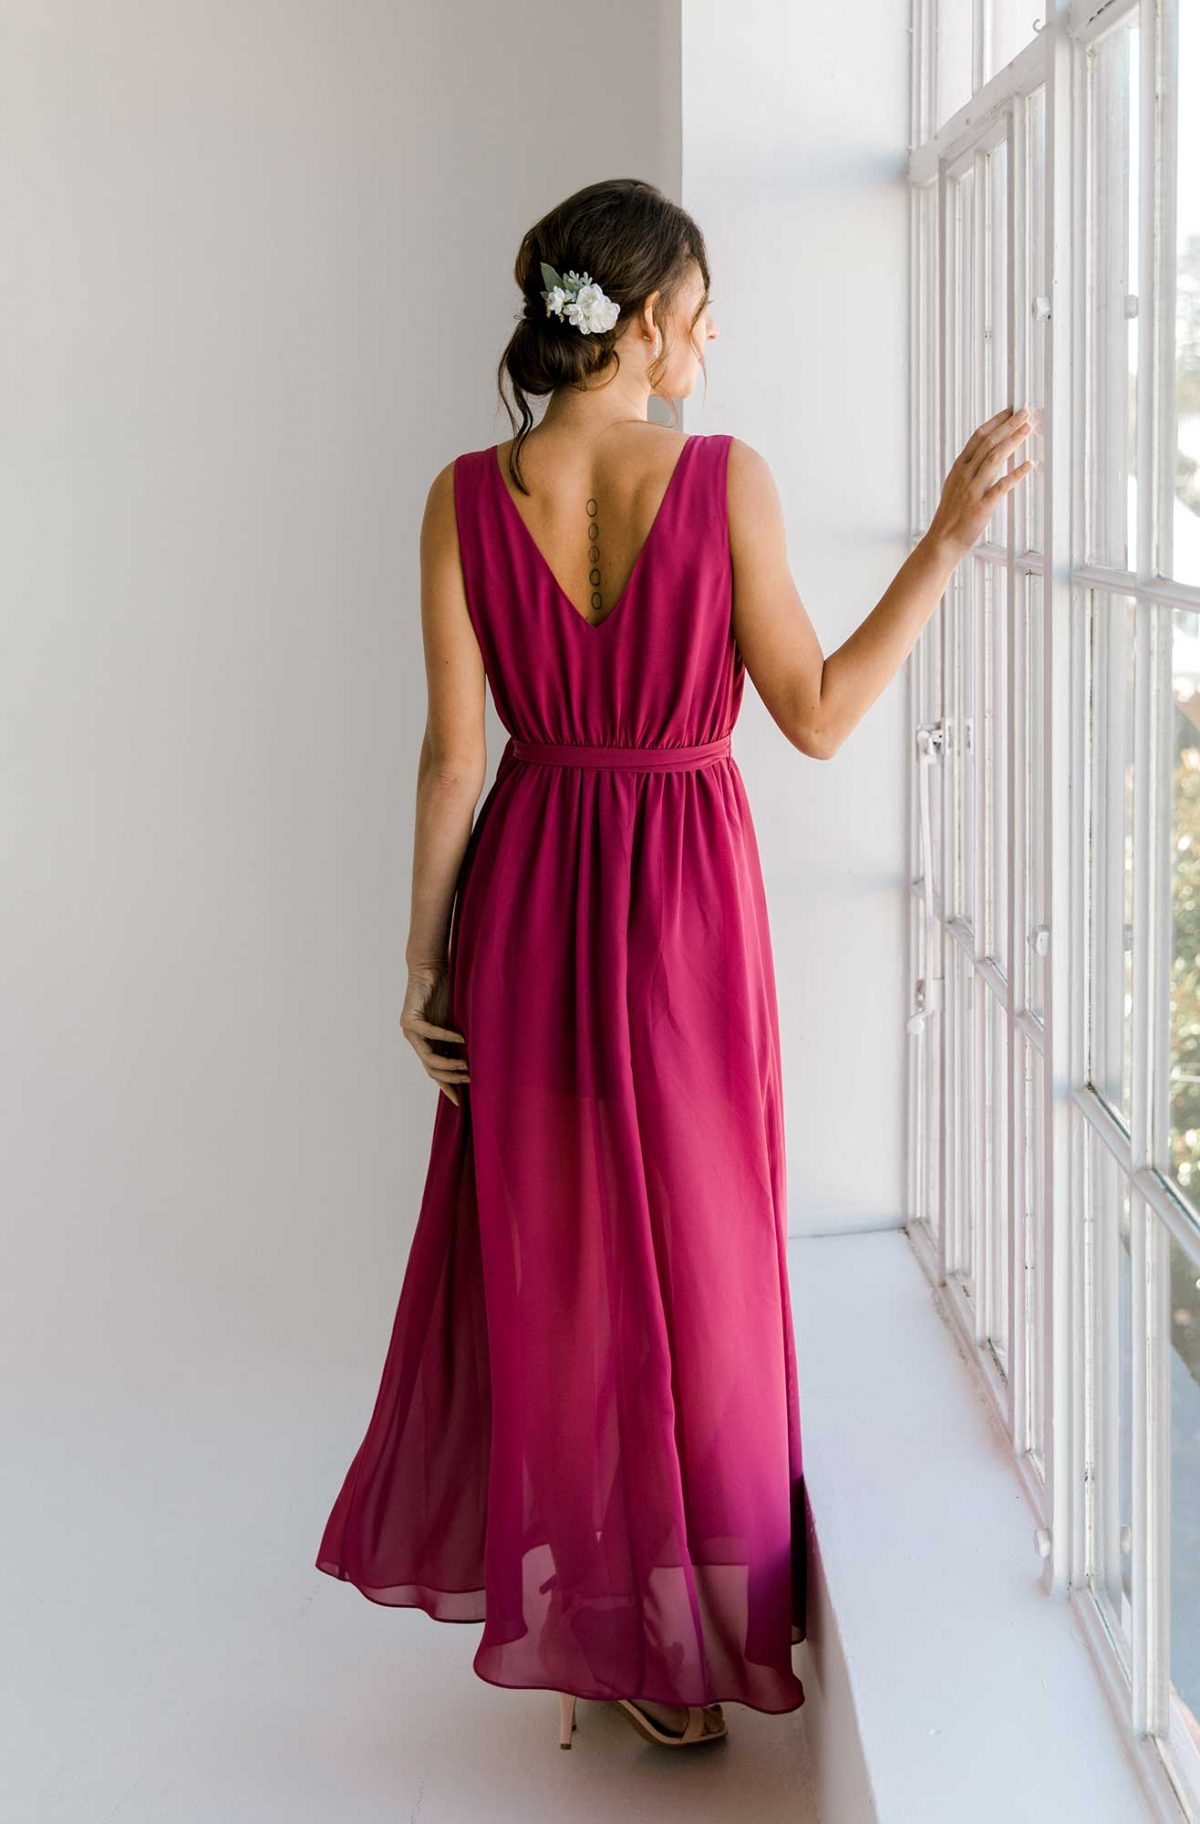 Sasha dress in raspberry colour back view